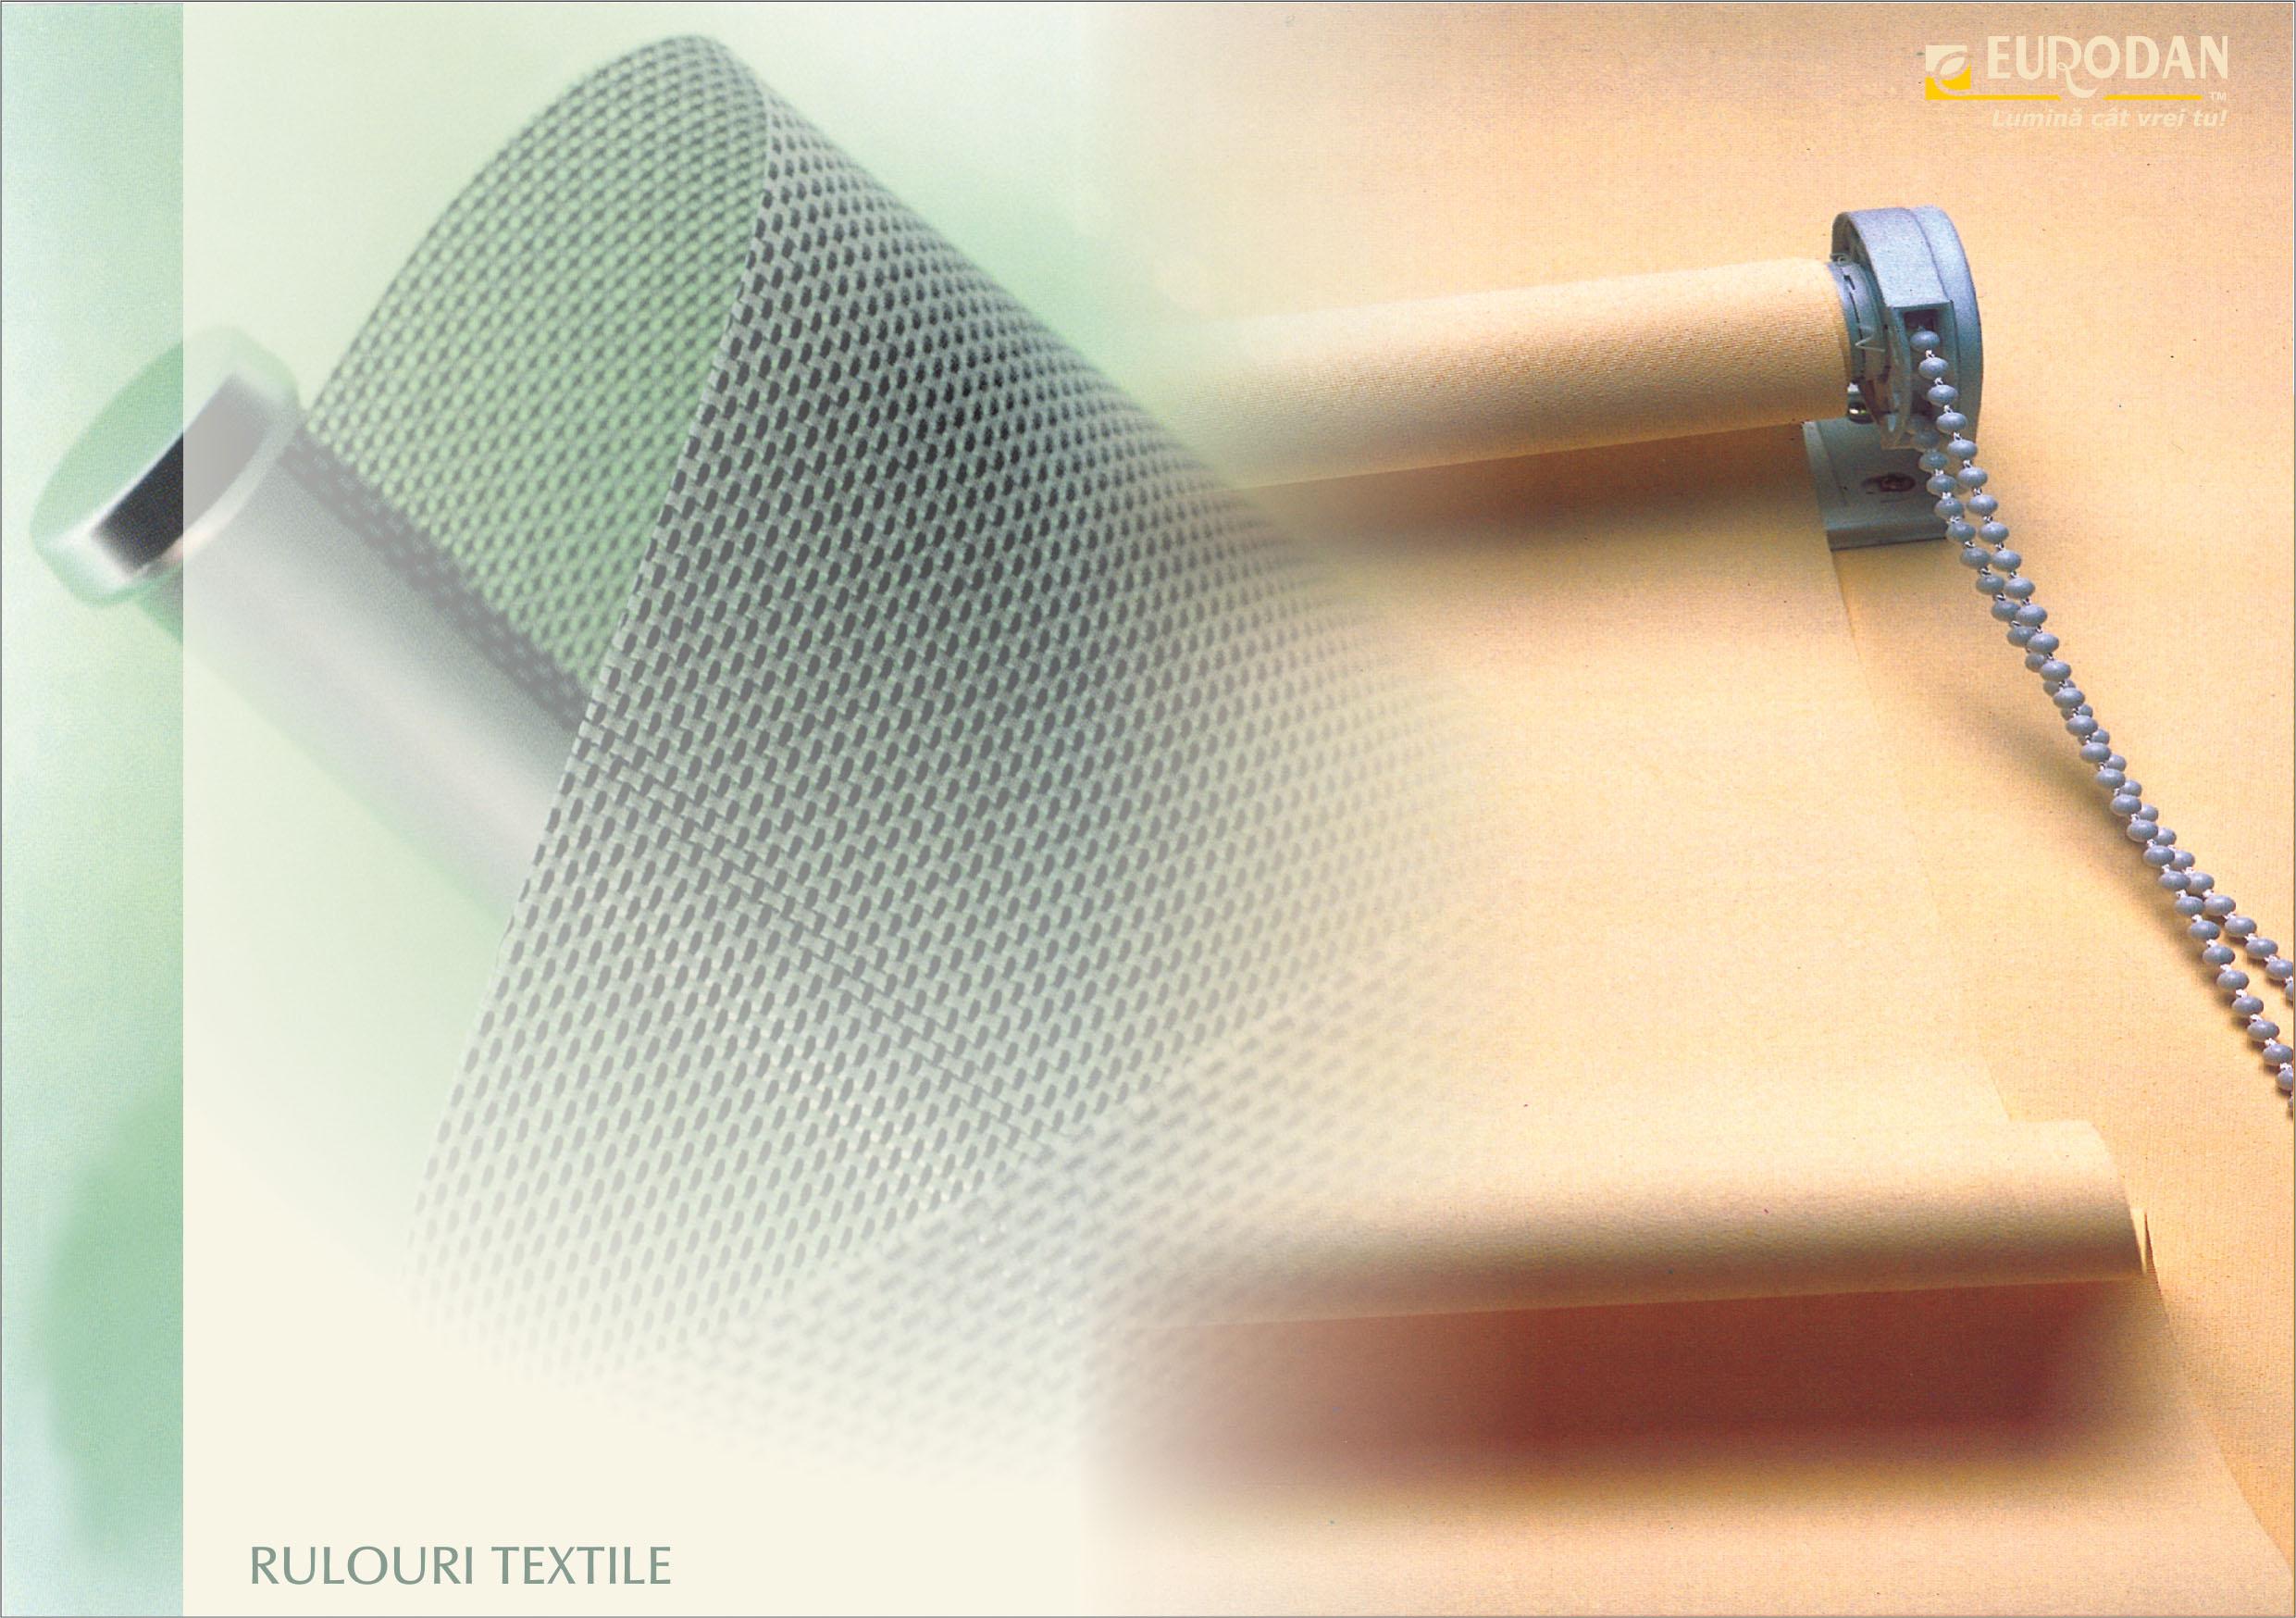 Rulouri textile EURO DAN - Poza 18